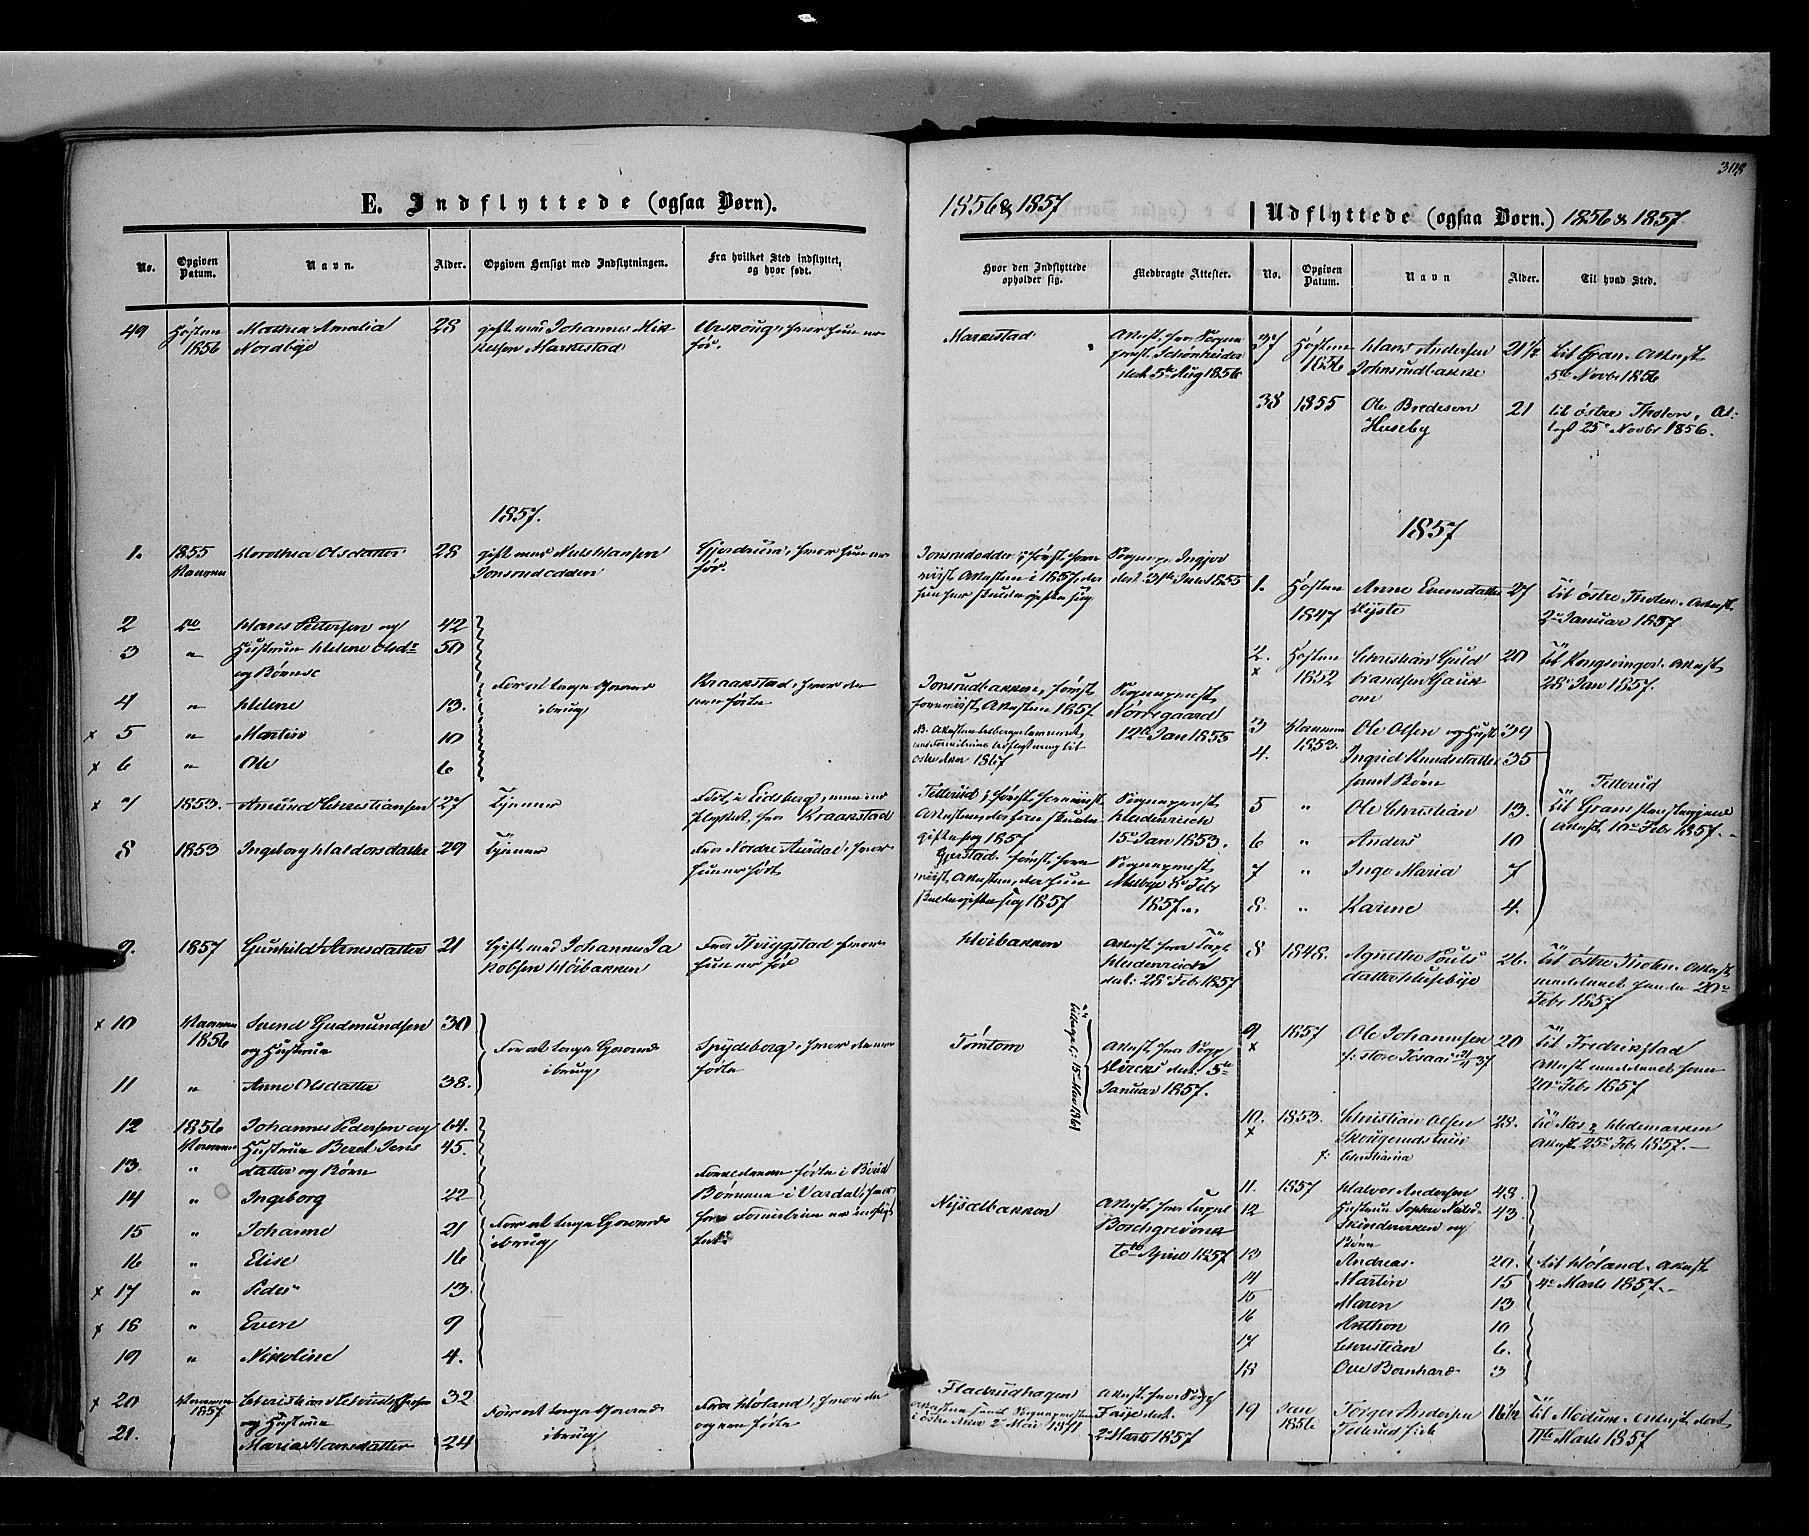 SAH, Vestre Toten prestekontor, H/Ha/Haa/L0006: Ministerialbok nr. 6, 1856-1861, s. 308